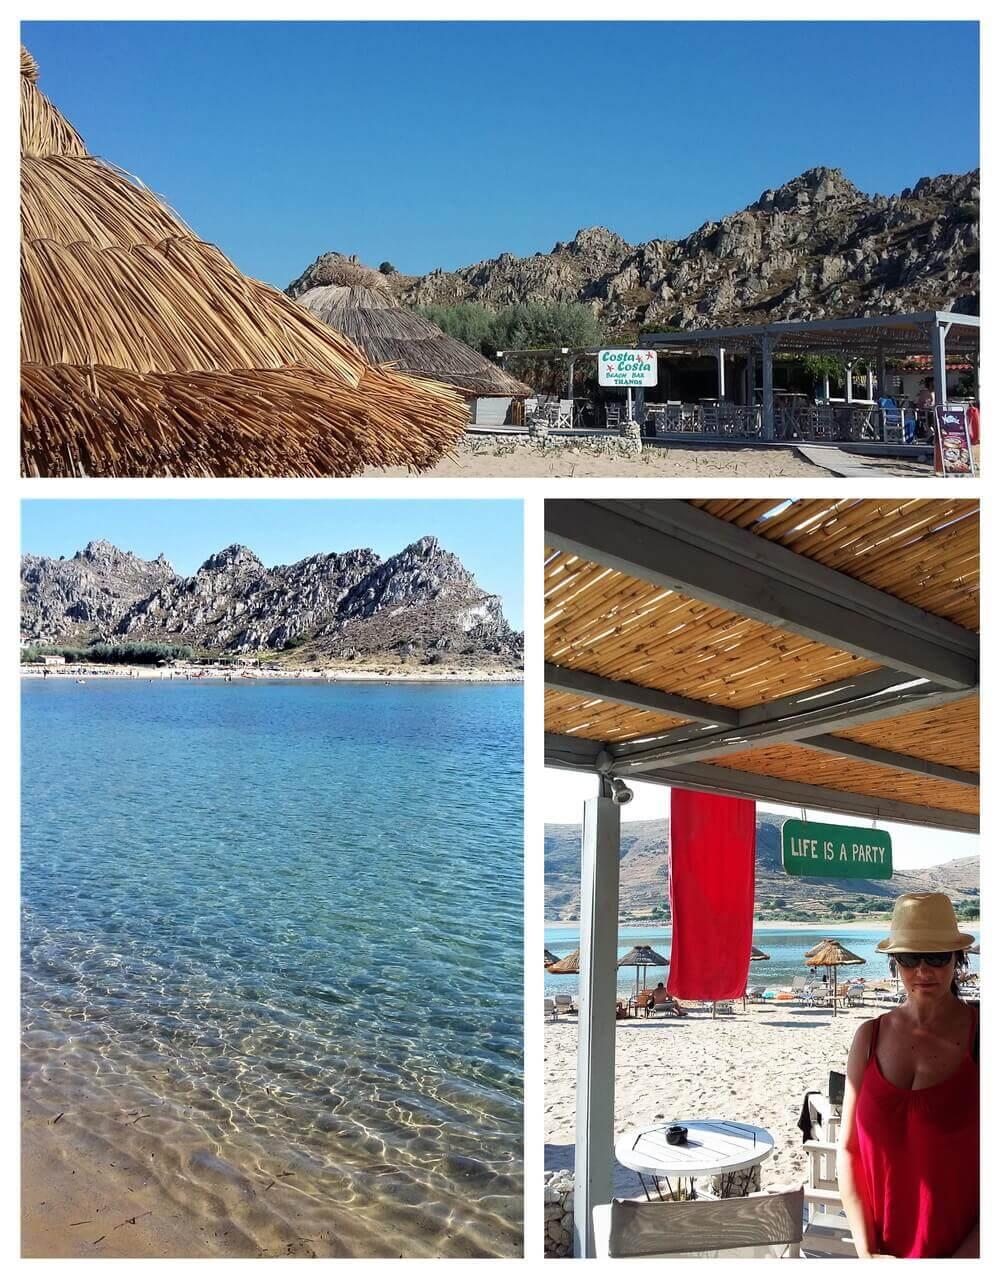 Thanos beach, Lemnos